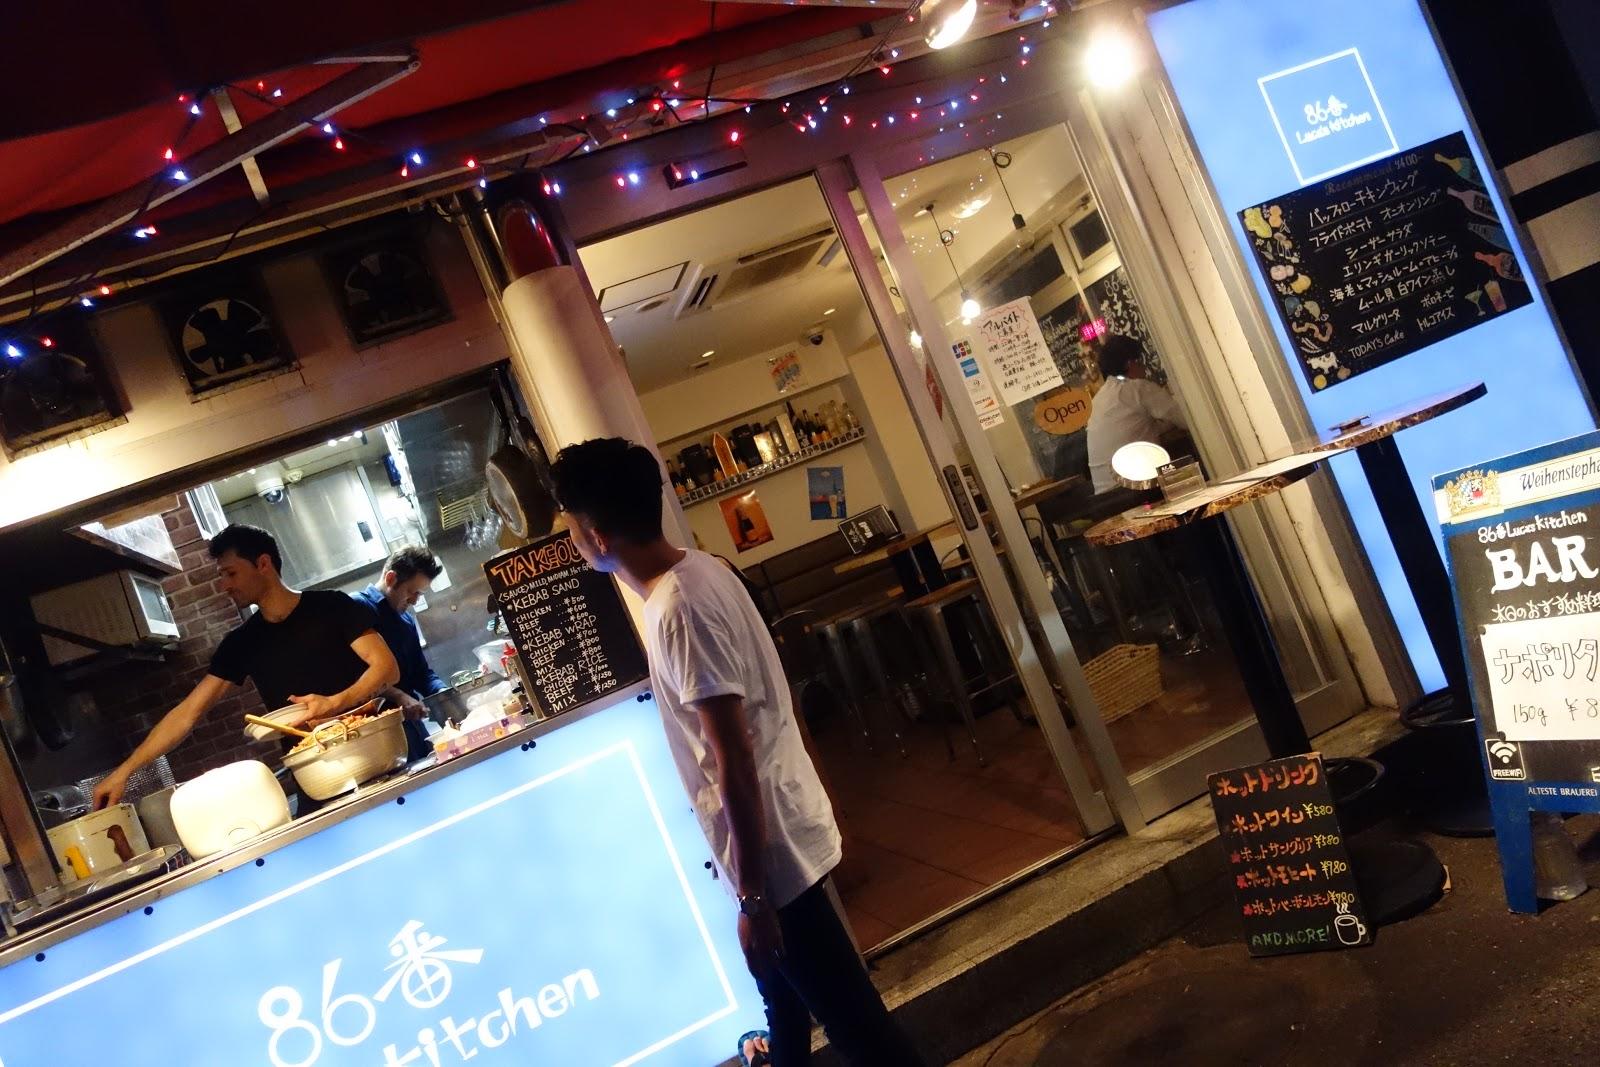 Nishi azabu 86 lucas kitchen for a rather dry 500 yen kebab ho hum